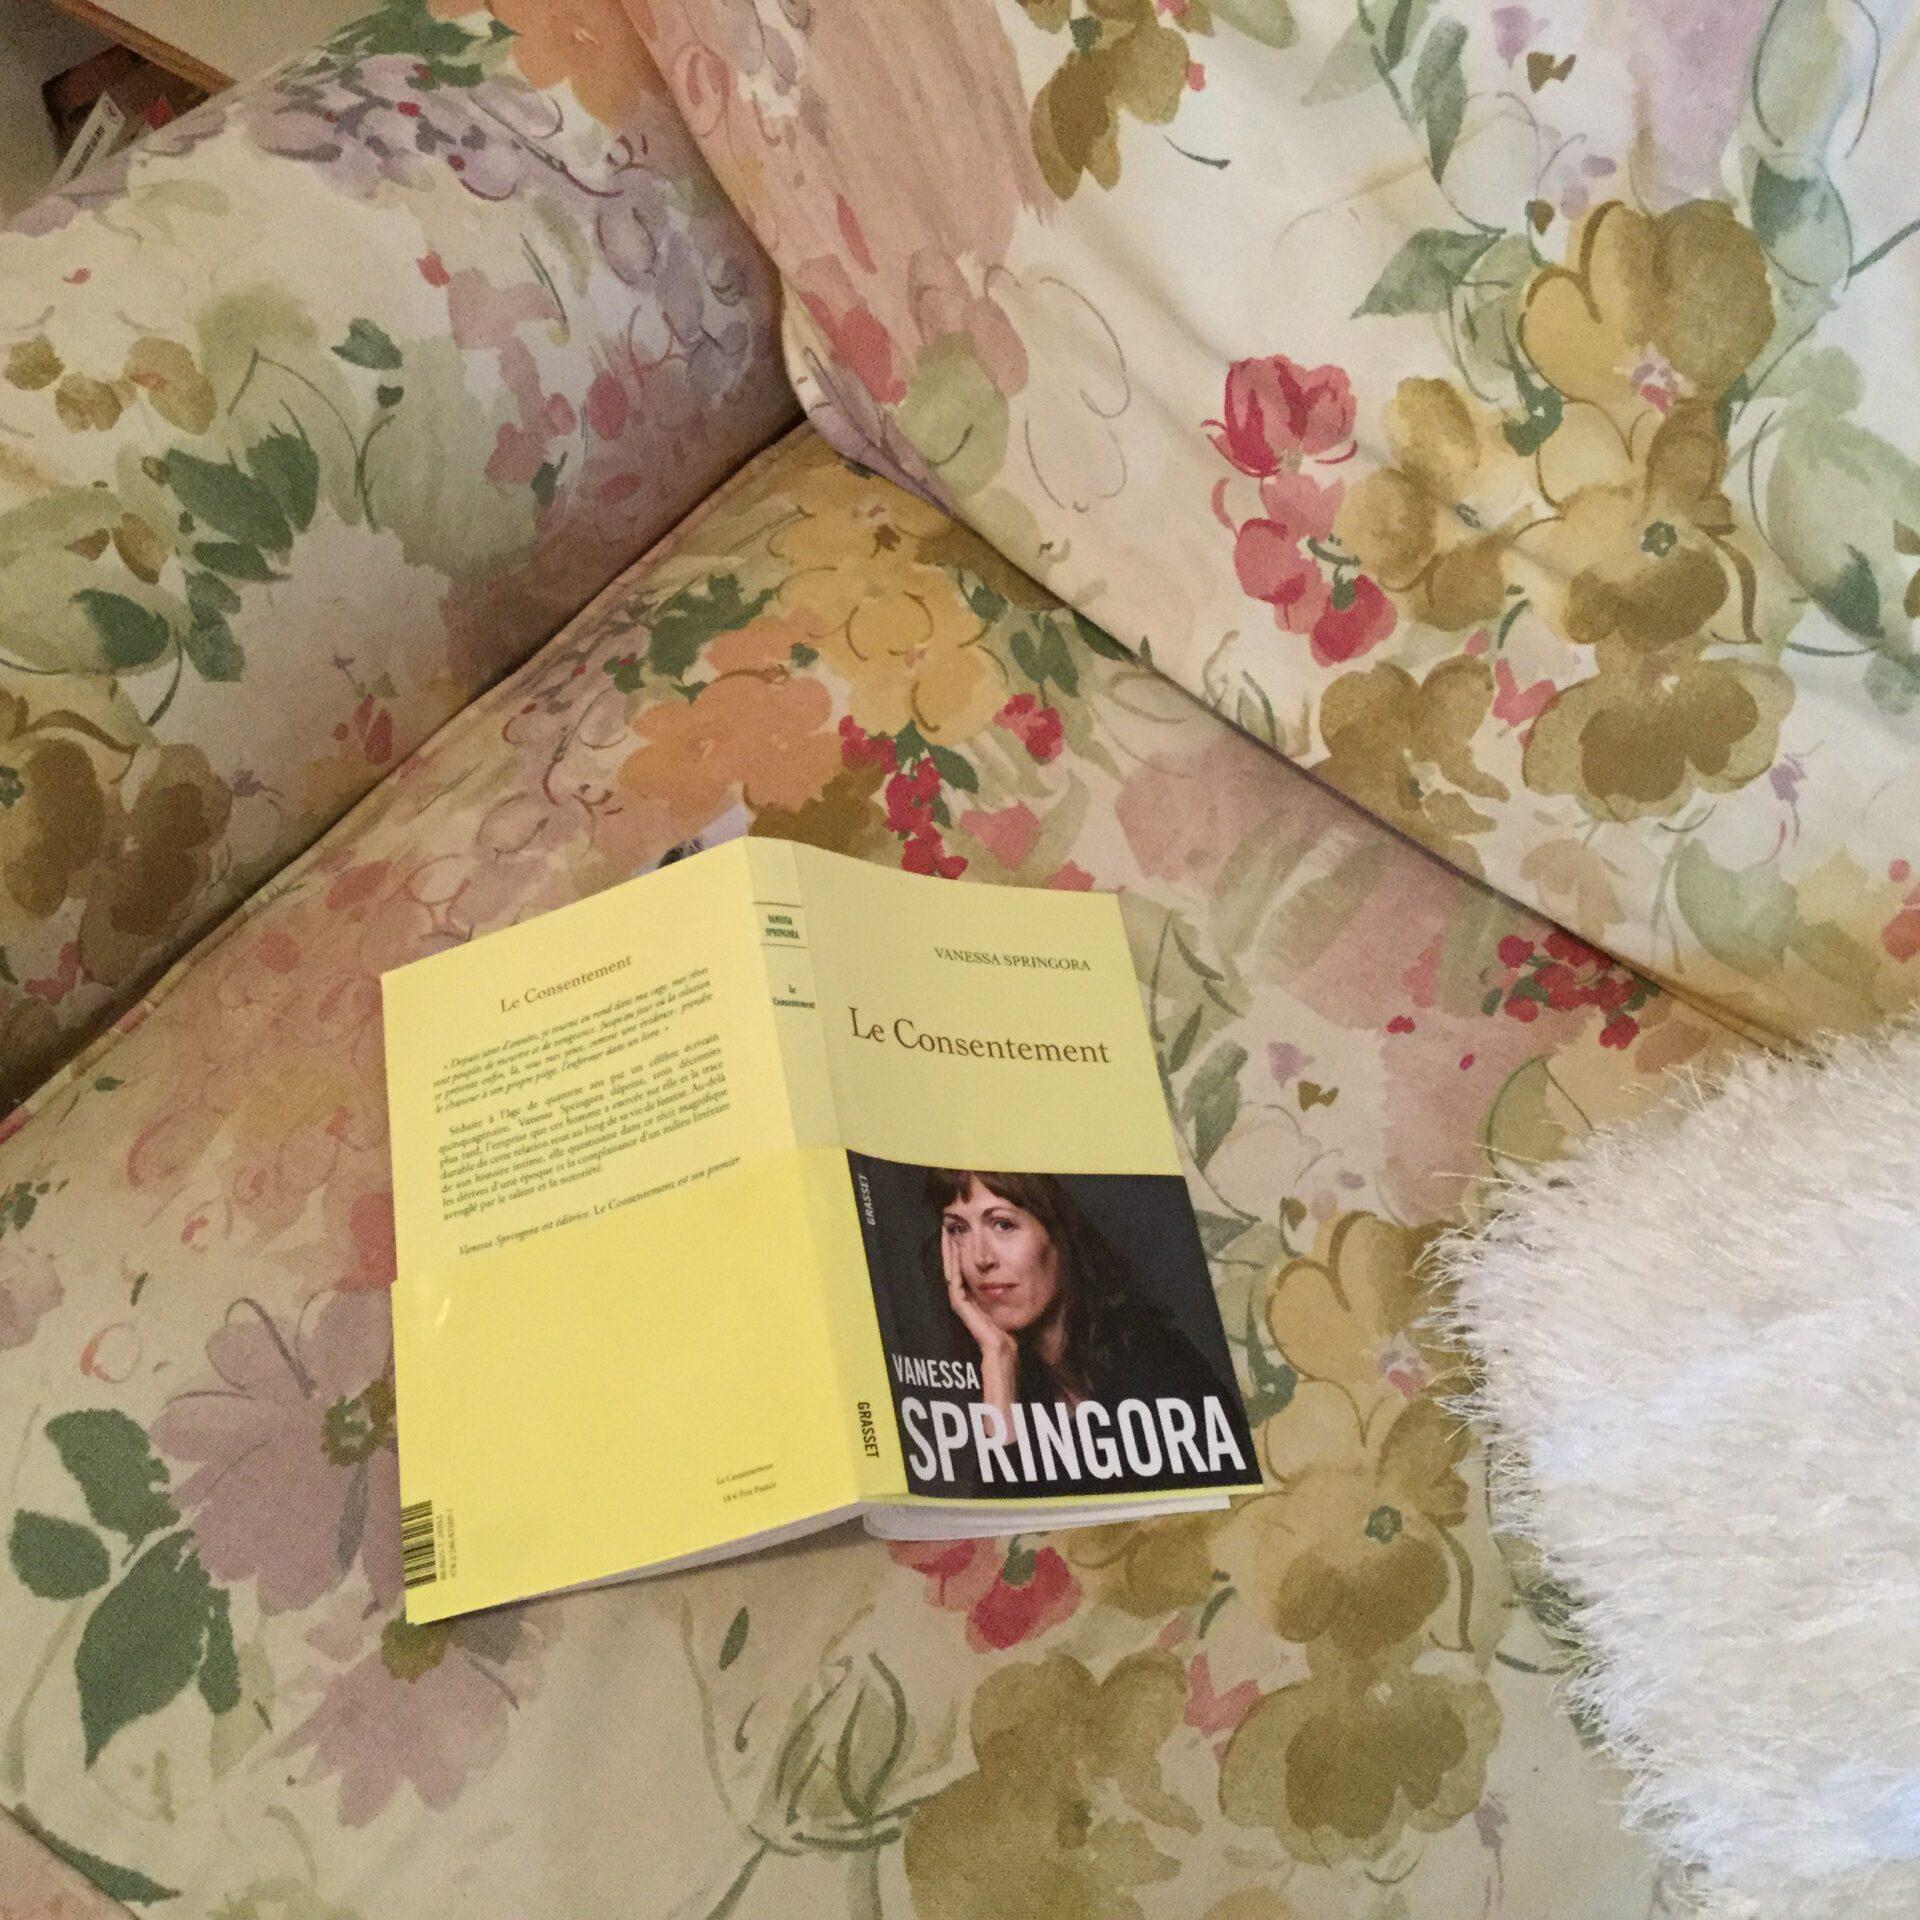 Le livre de Vanessa Springora